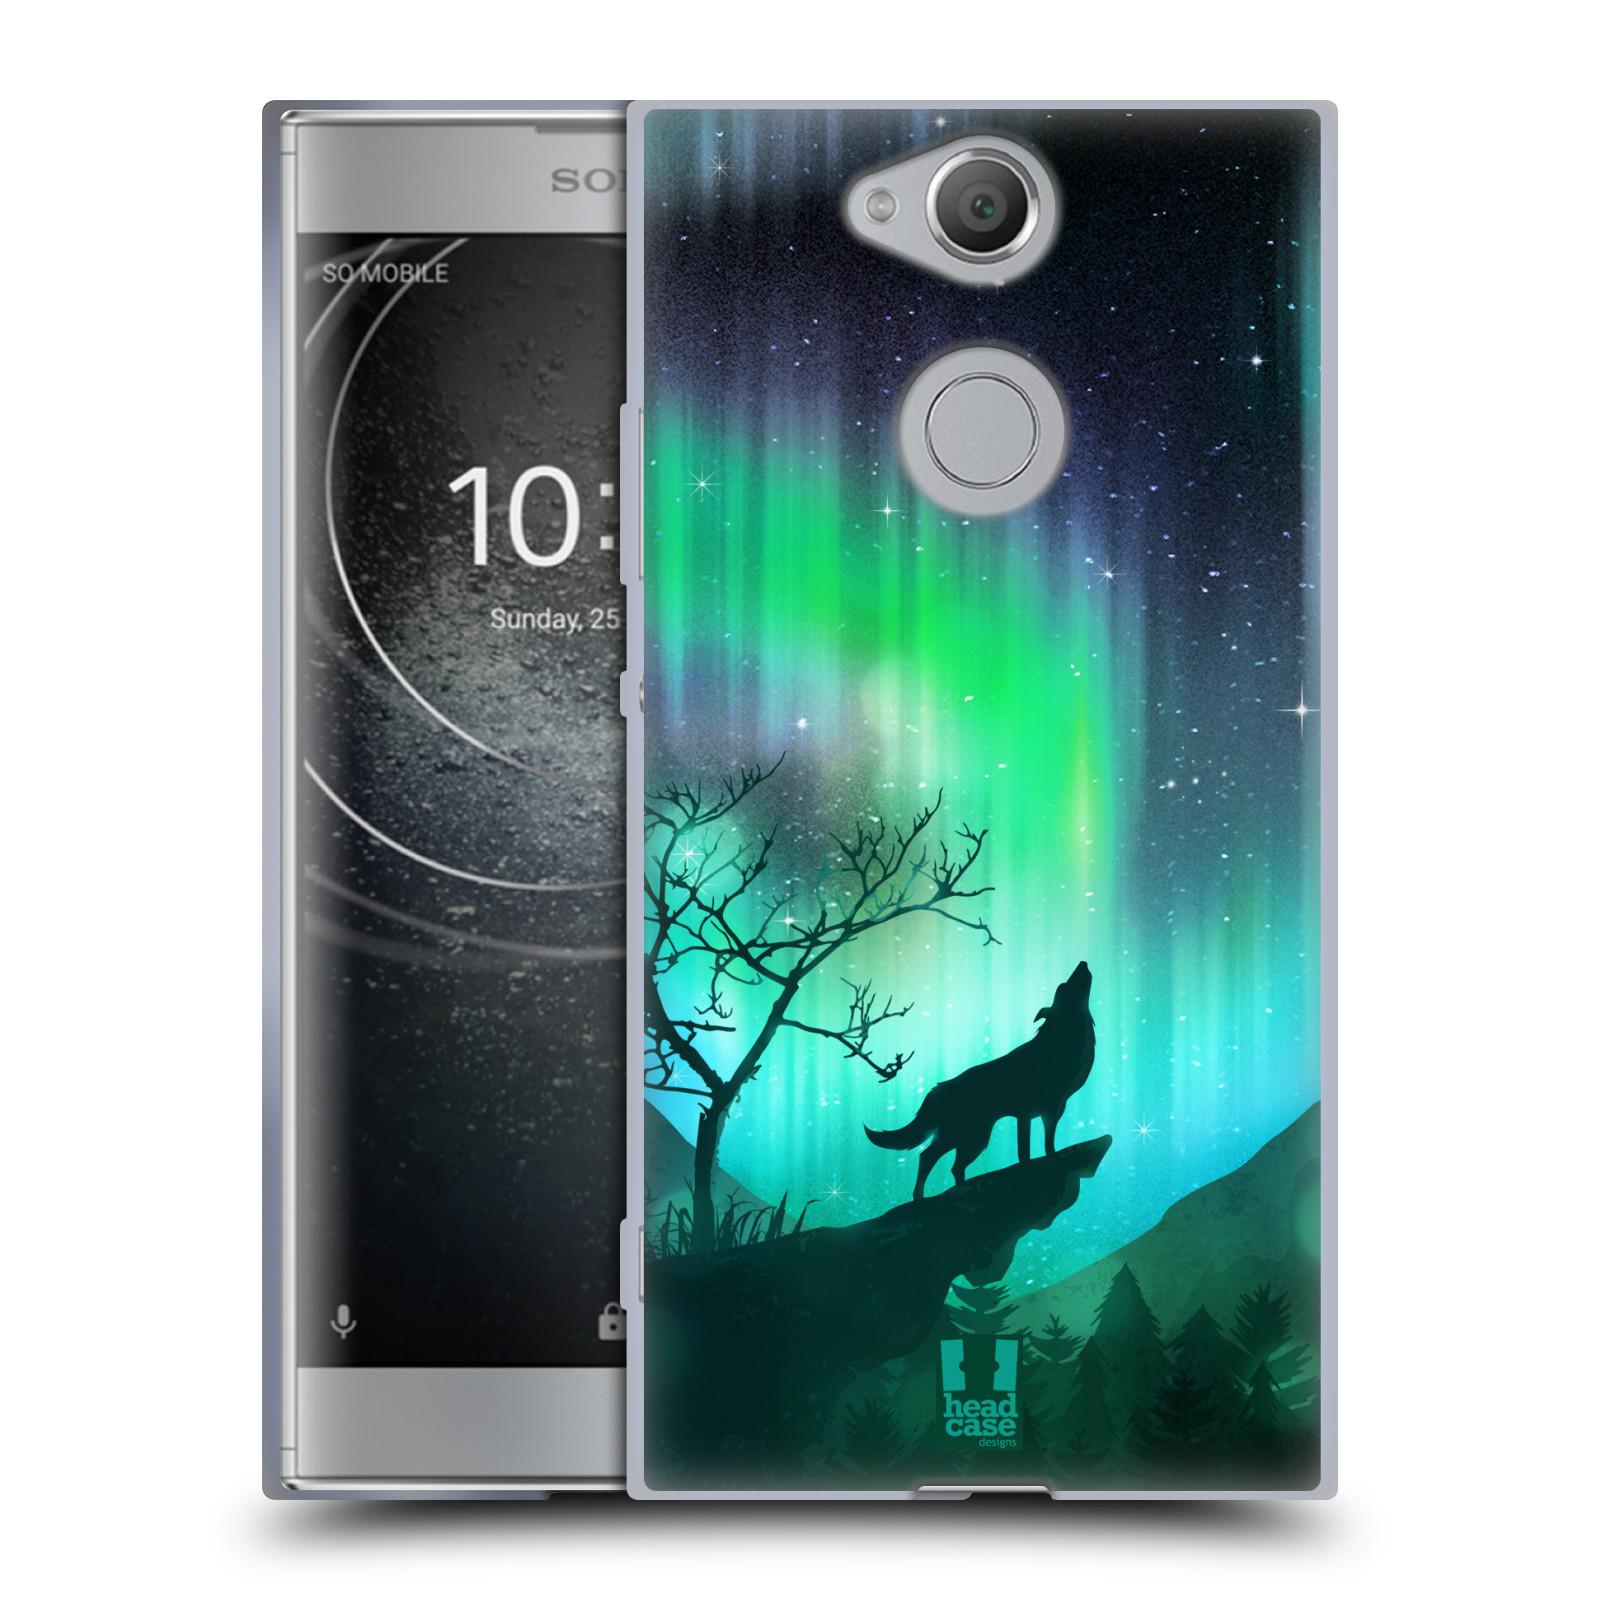 Silikonové pouzdro na mobil Sony Xperia XA2 - Head Case - POLÁRNÍ ZÁŘE VLK (Silikonový kryt či obal na mobilní telefon Sony Xperia XA2 H4113 s motivem POLÁRNÍ ZÁŘE VLK)